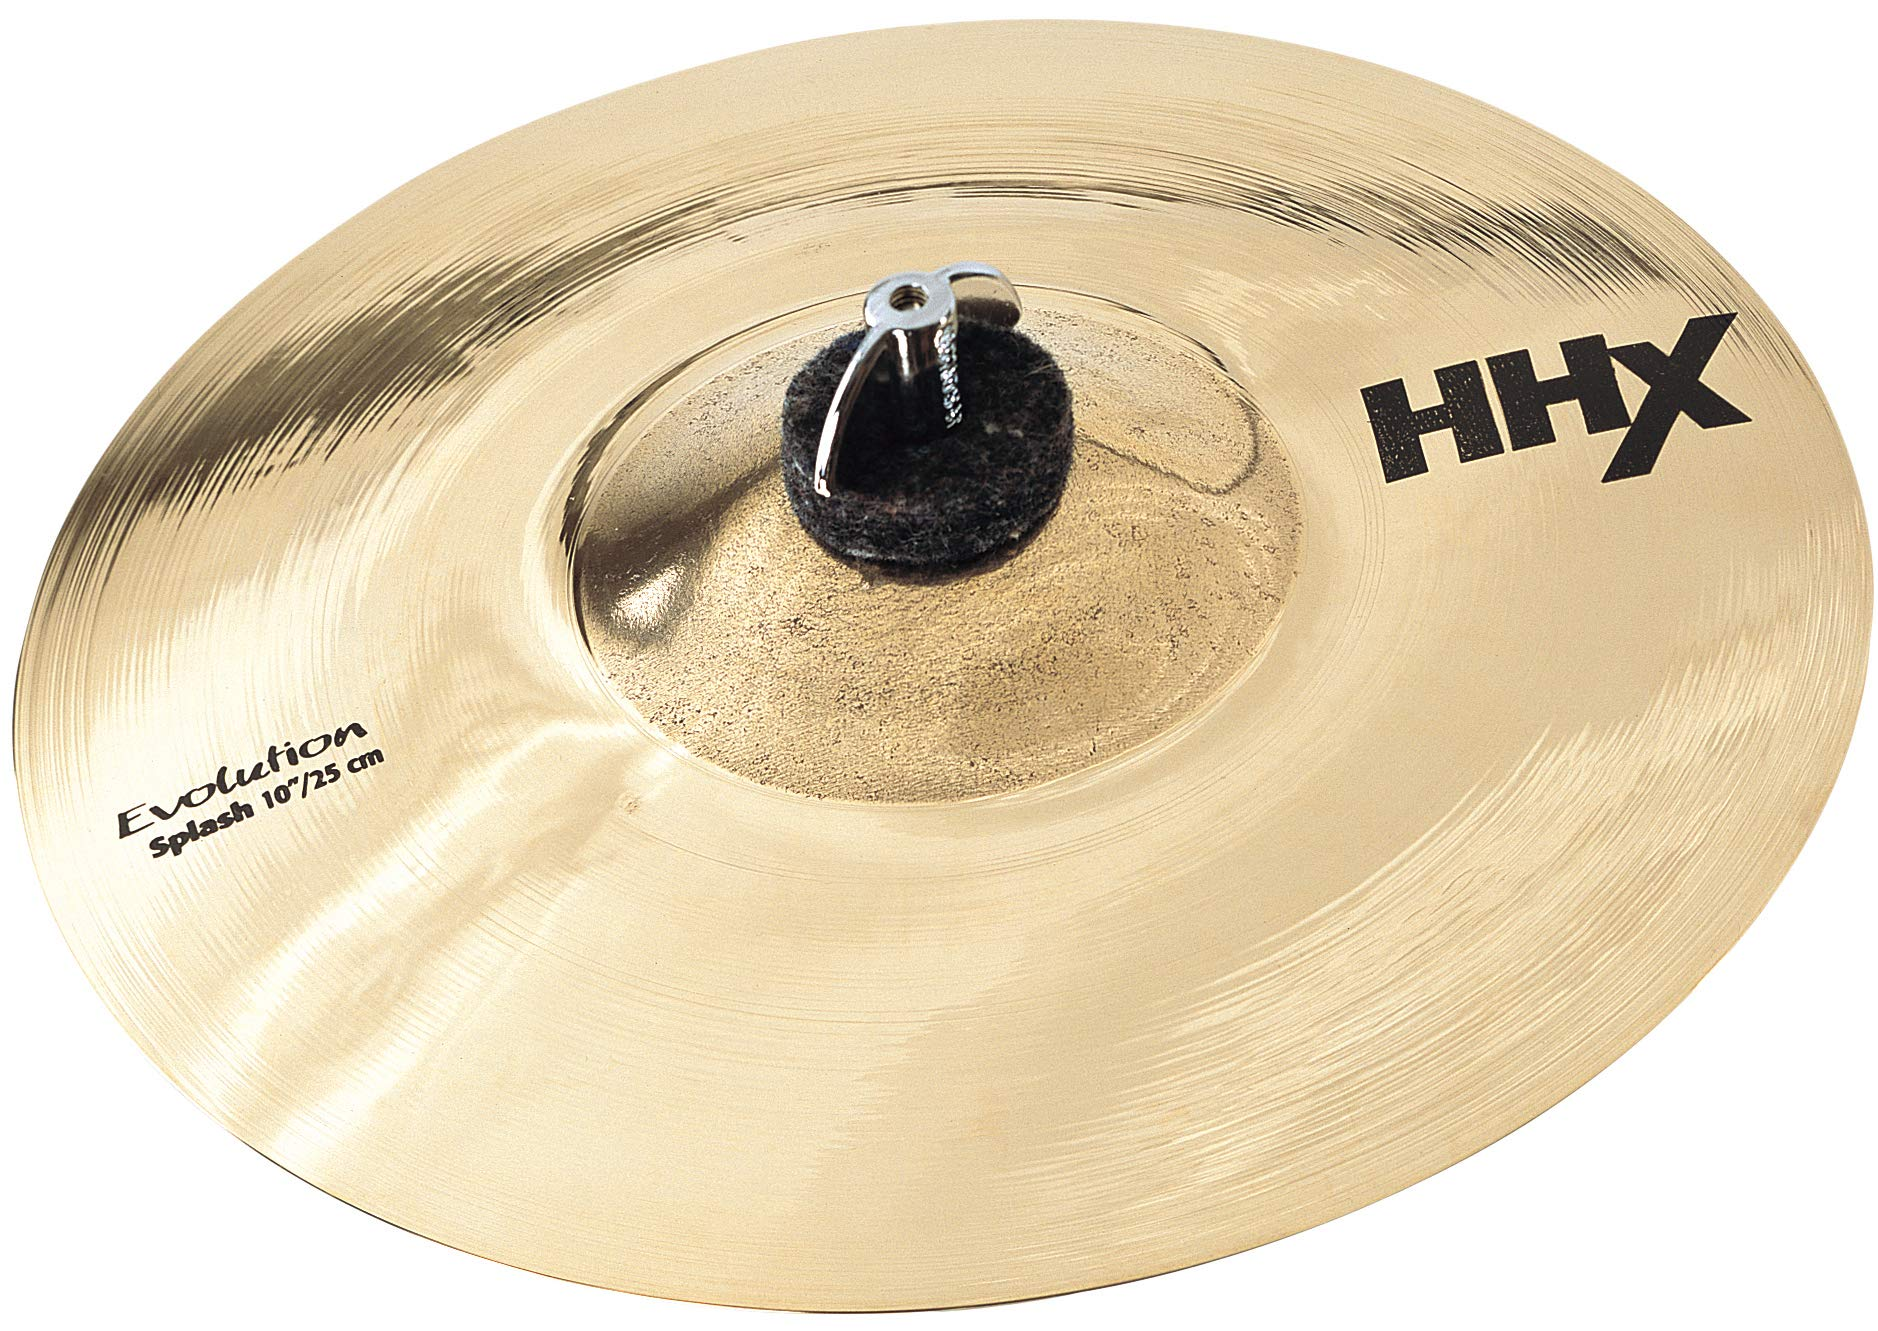 Sabian HHX 10'' Evolution Splash Cymbal, Brilliant Finish by Sabian